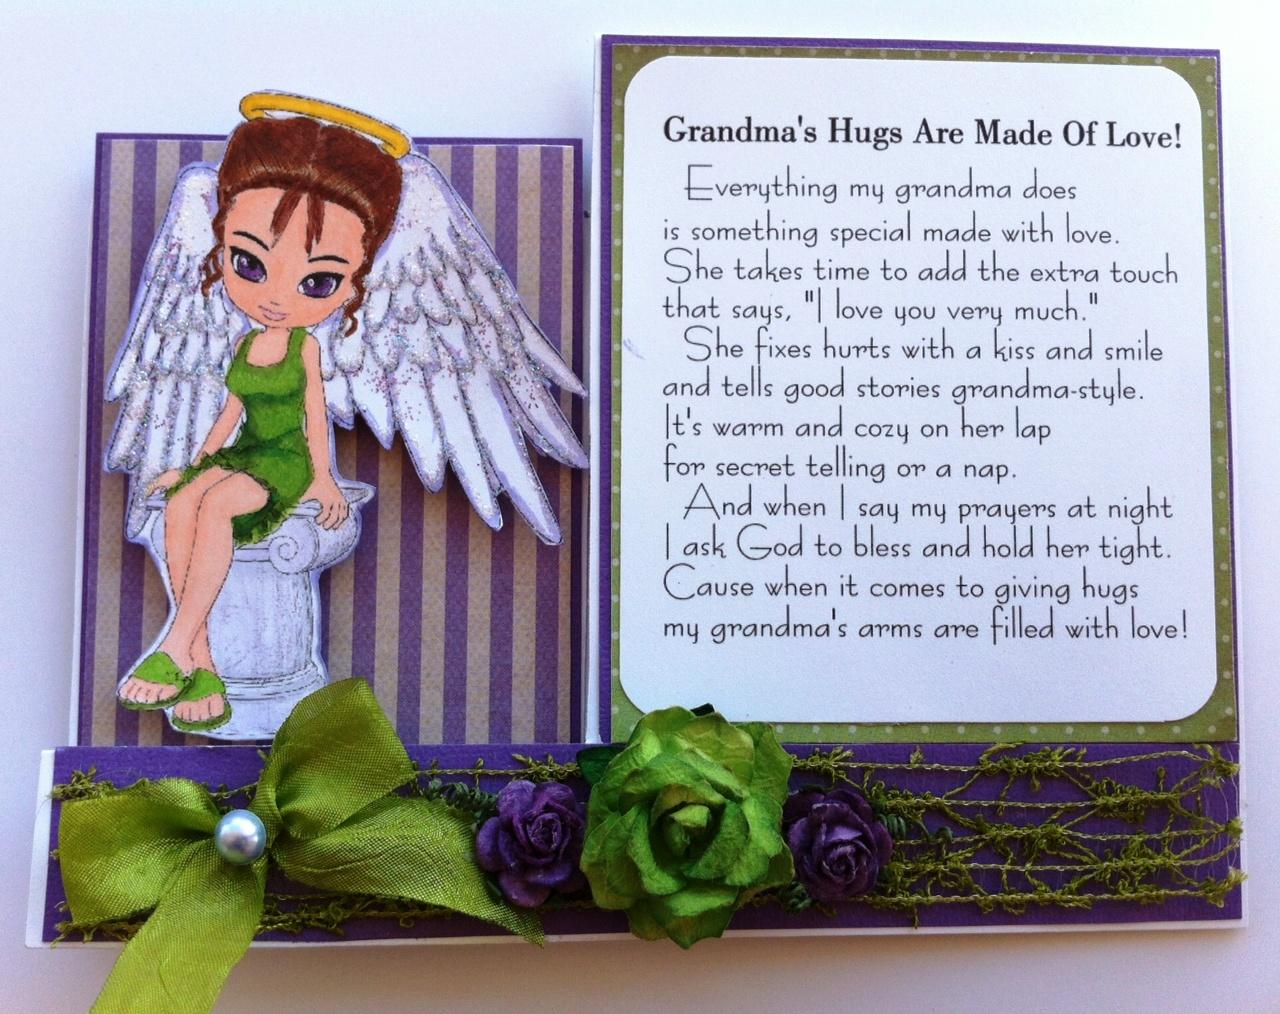 Valentines Day Quotes For Grandma: Sweet Grandma Quotes. QuotesGram